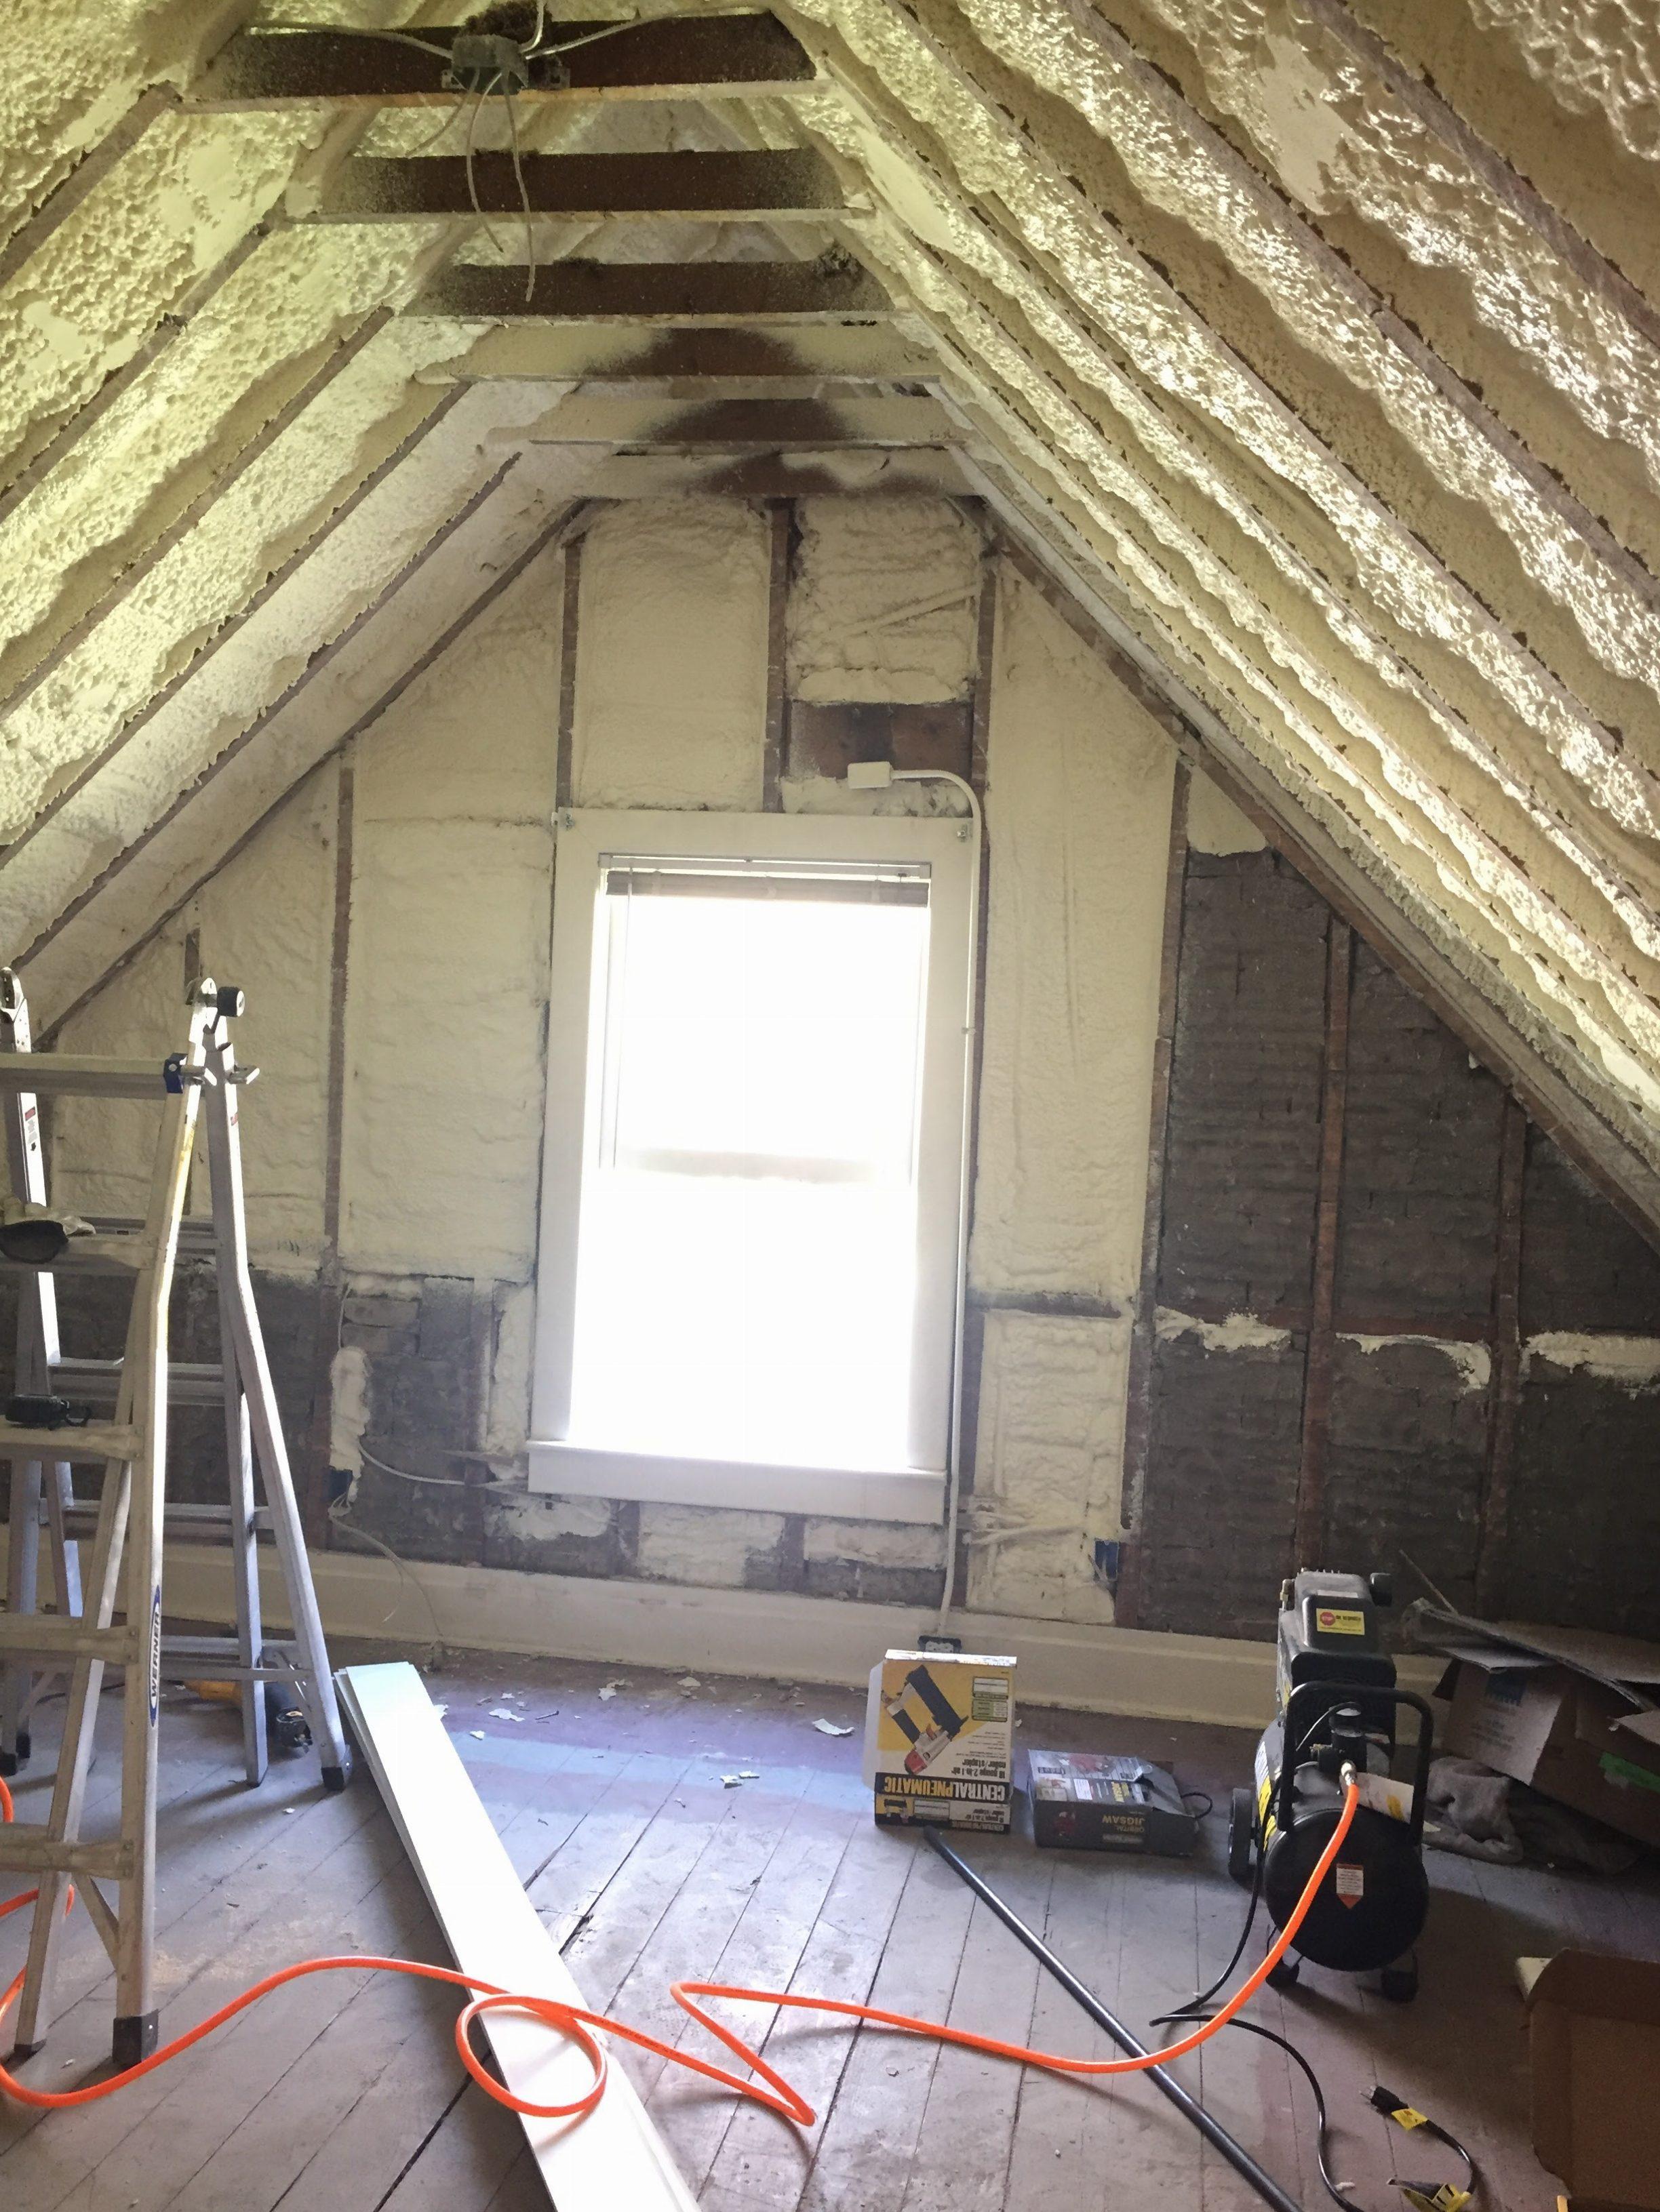 Spray Foam Insulation in the Attic Bedroom Rafters